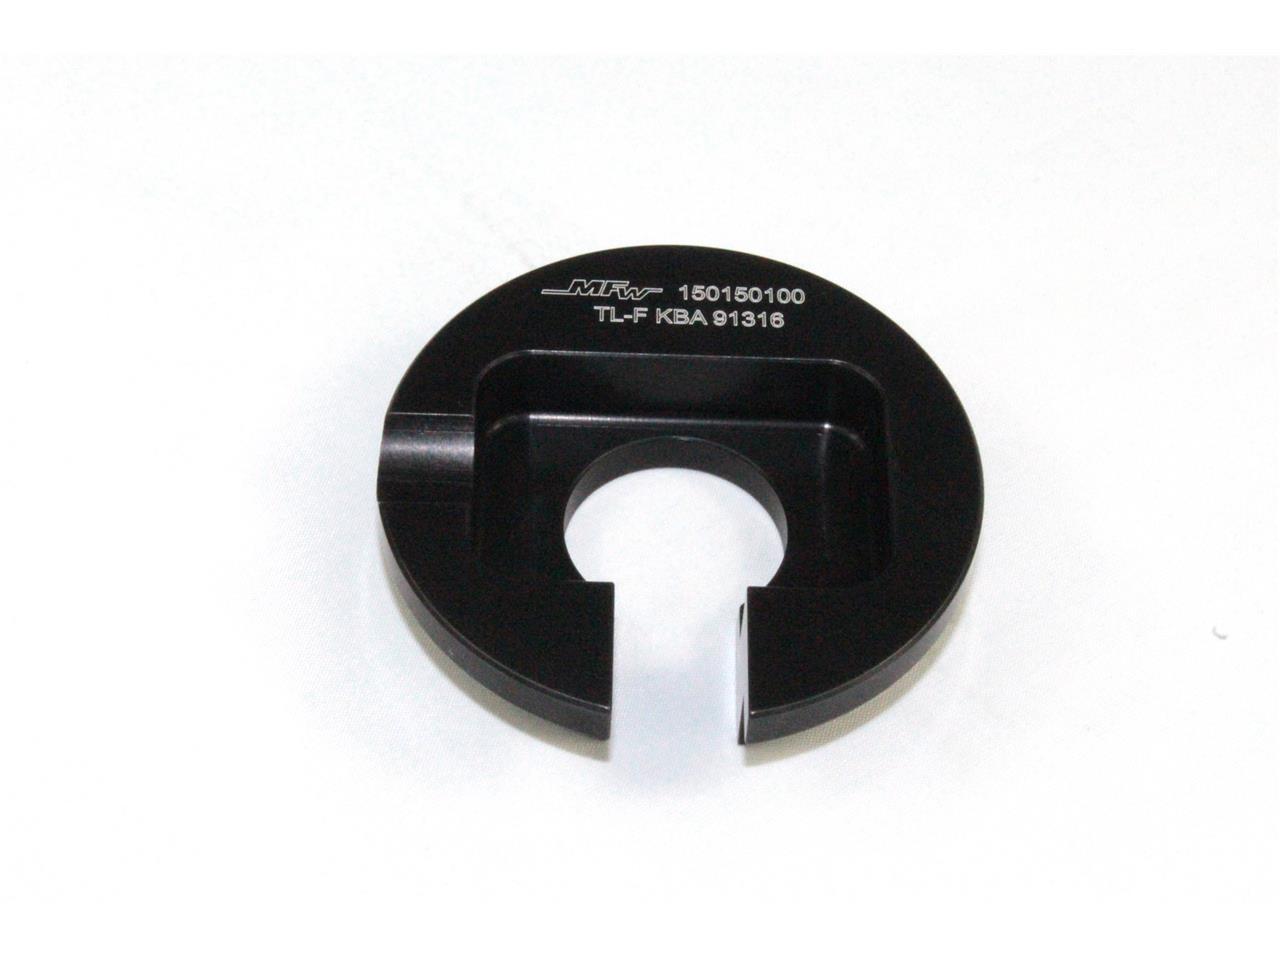 TECHNIUM ローダウンキット15タイプ BUELL XB9/XB12用(Tecnium Lowering Kit 15-type Buell XB9 / XB12【ヨーロッパ直輸入品】)